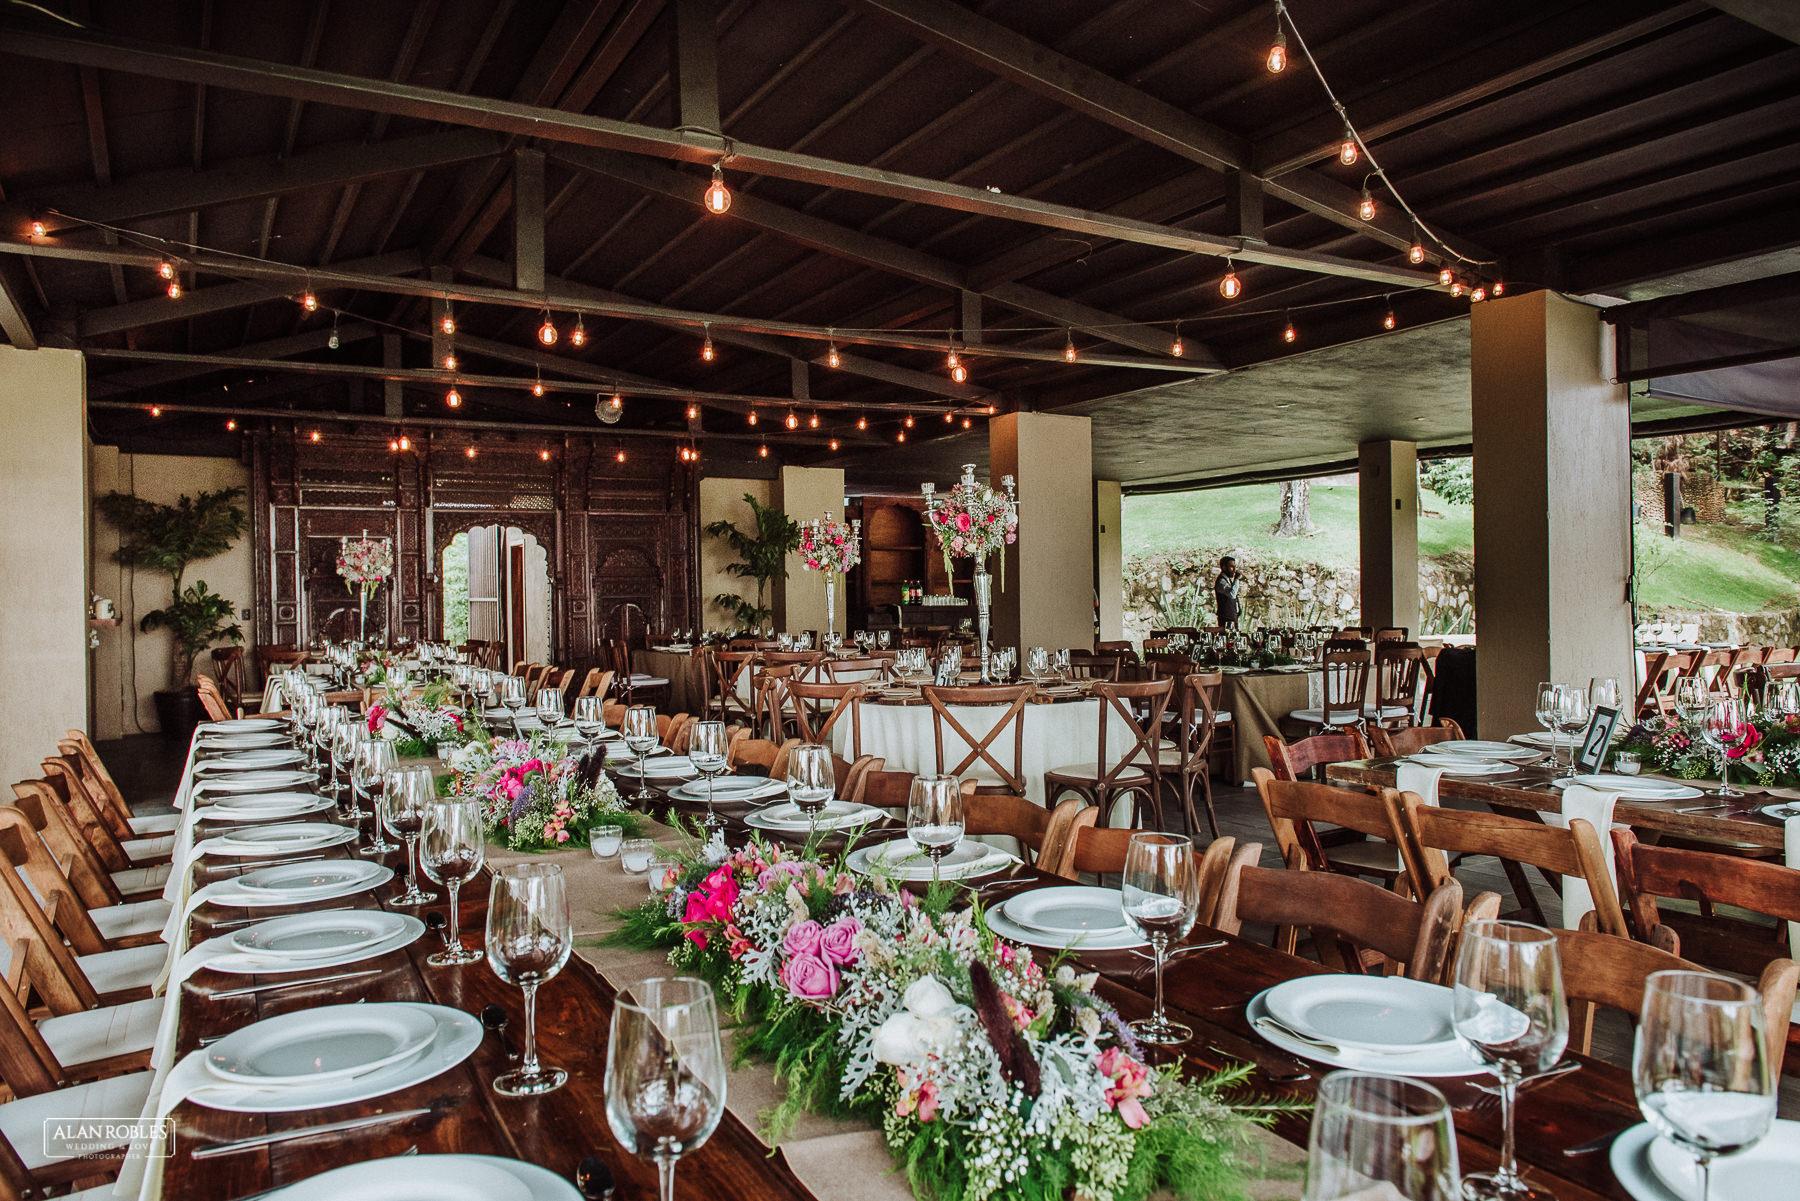 Fotografo de bodas guadalajara Alan Robles - Pinare terraza bistro 2